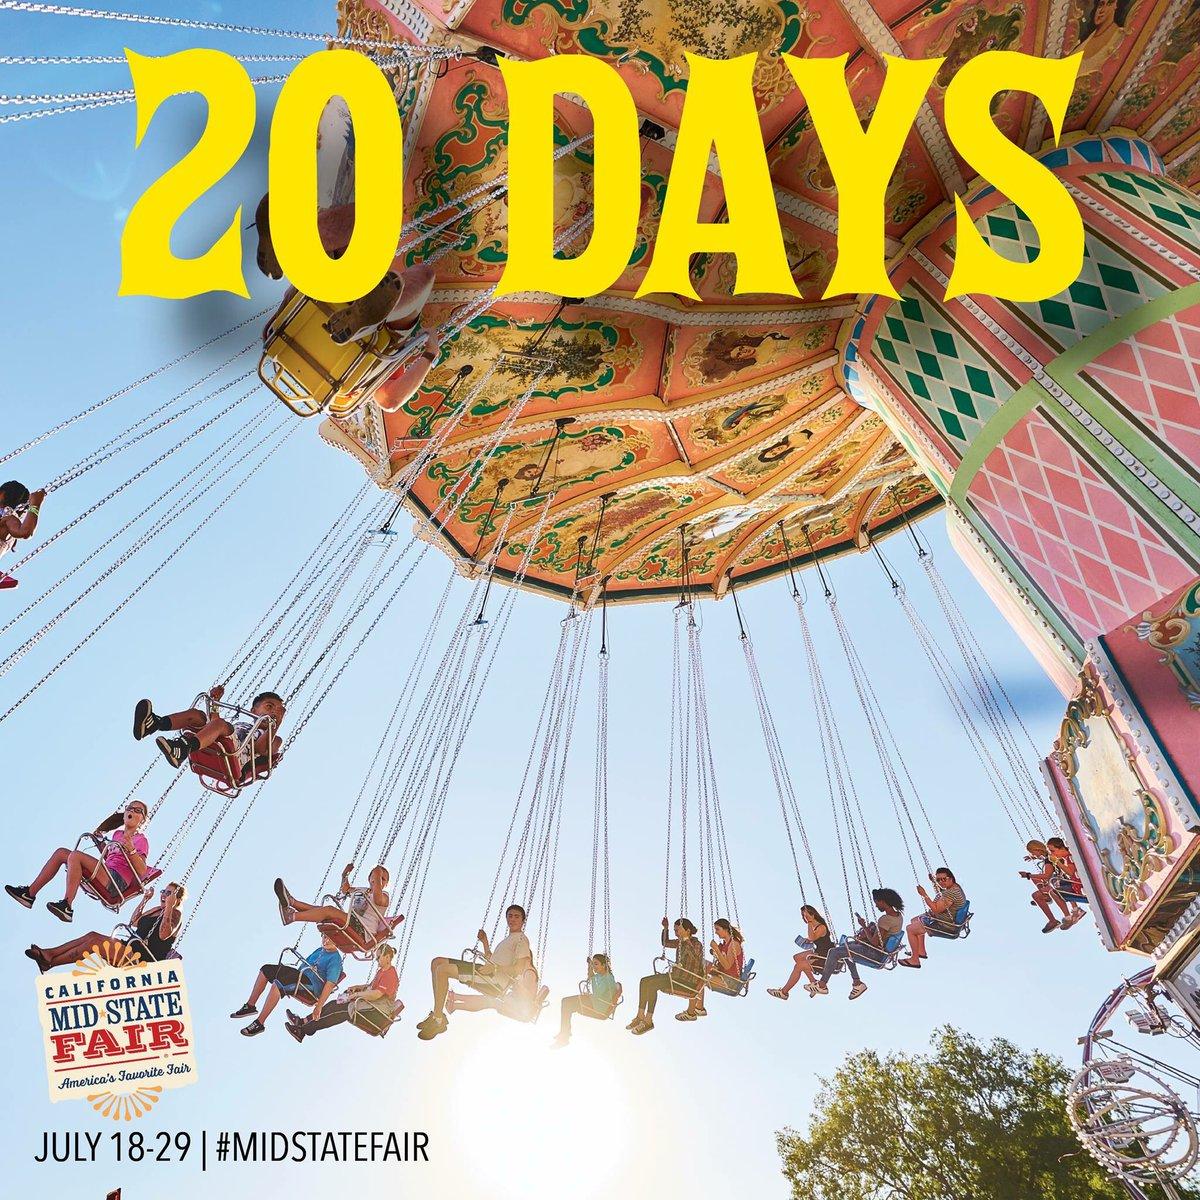 Paso Robles Mid State Fair 2020.California Mid State Fair On Twitter Twenty Days